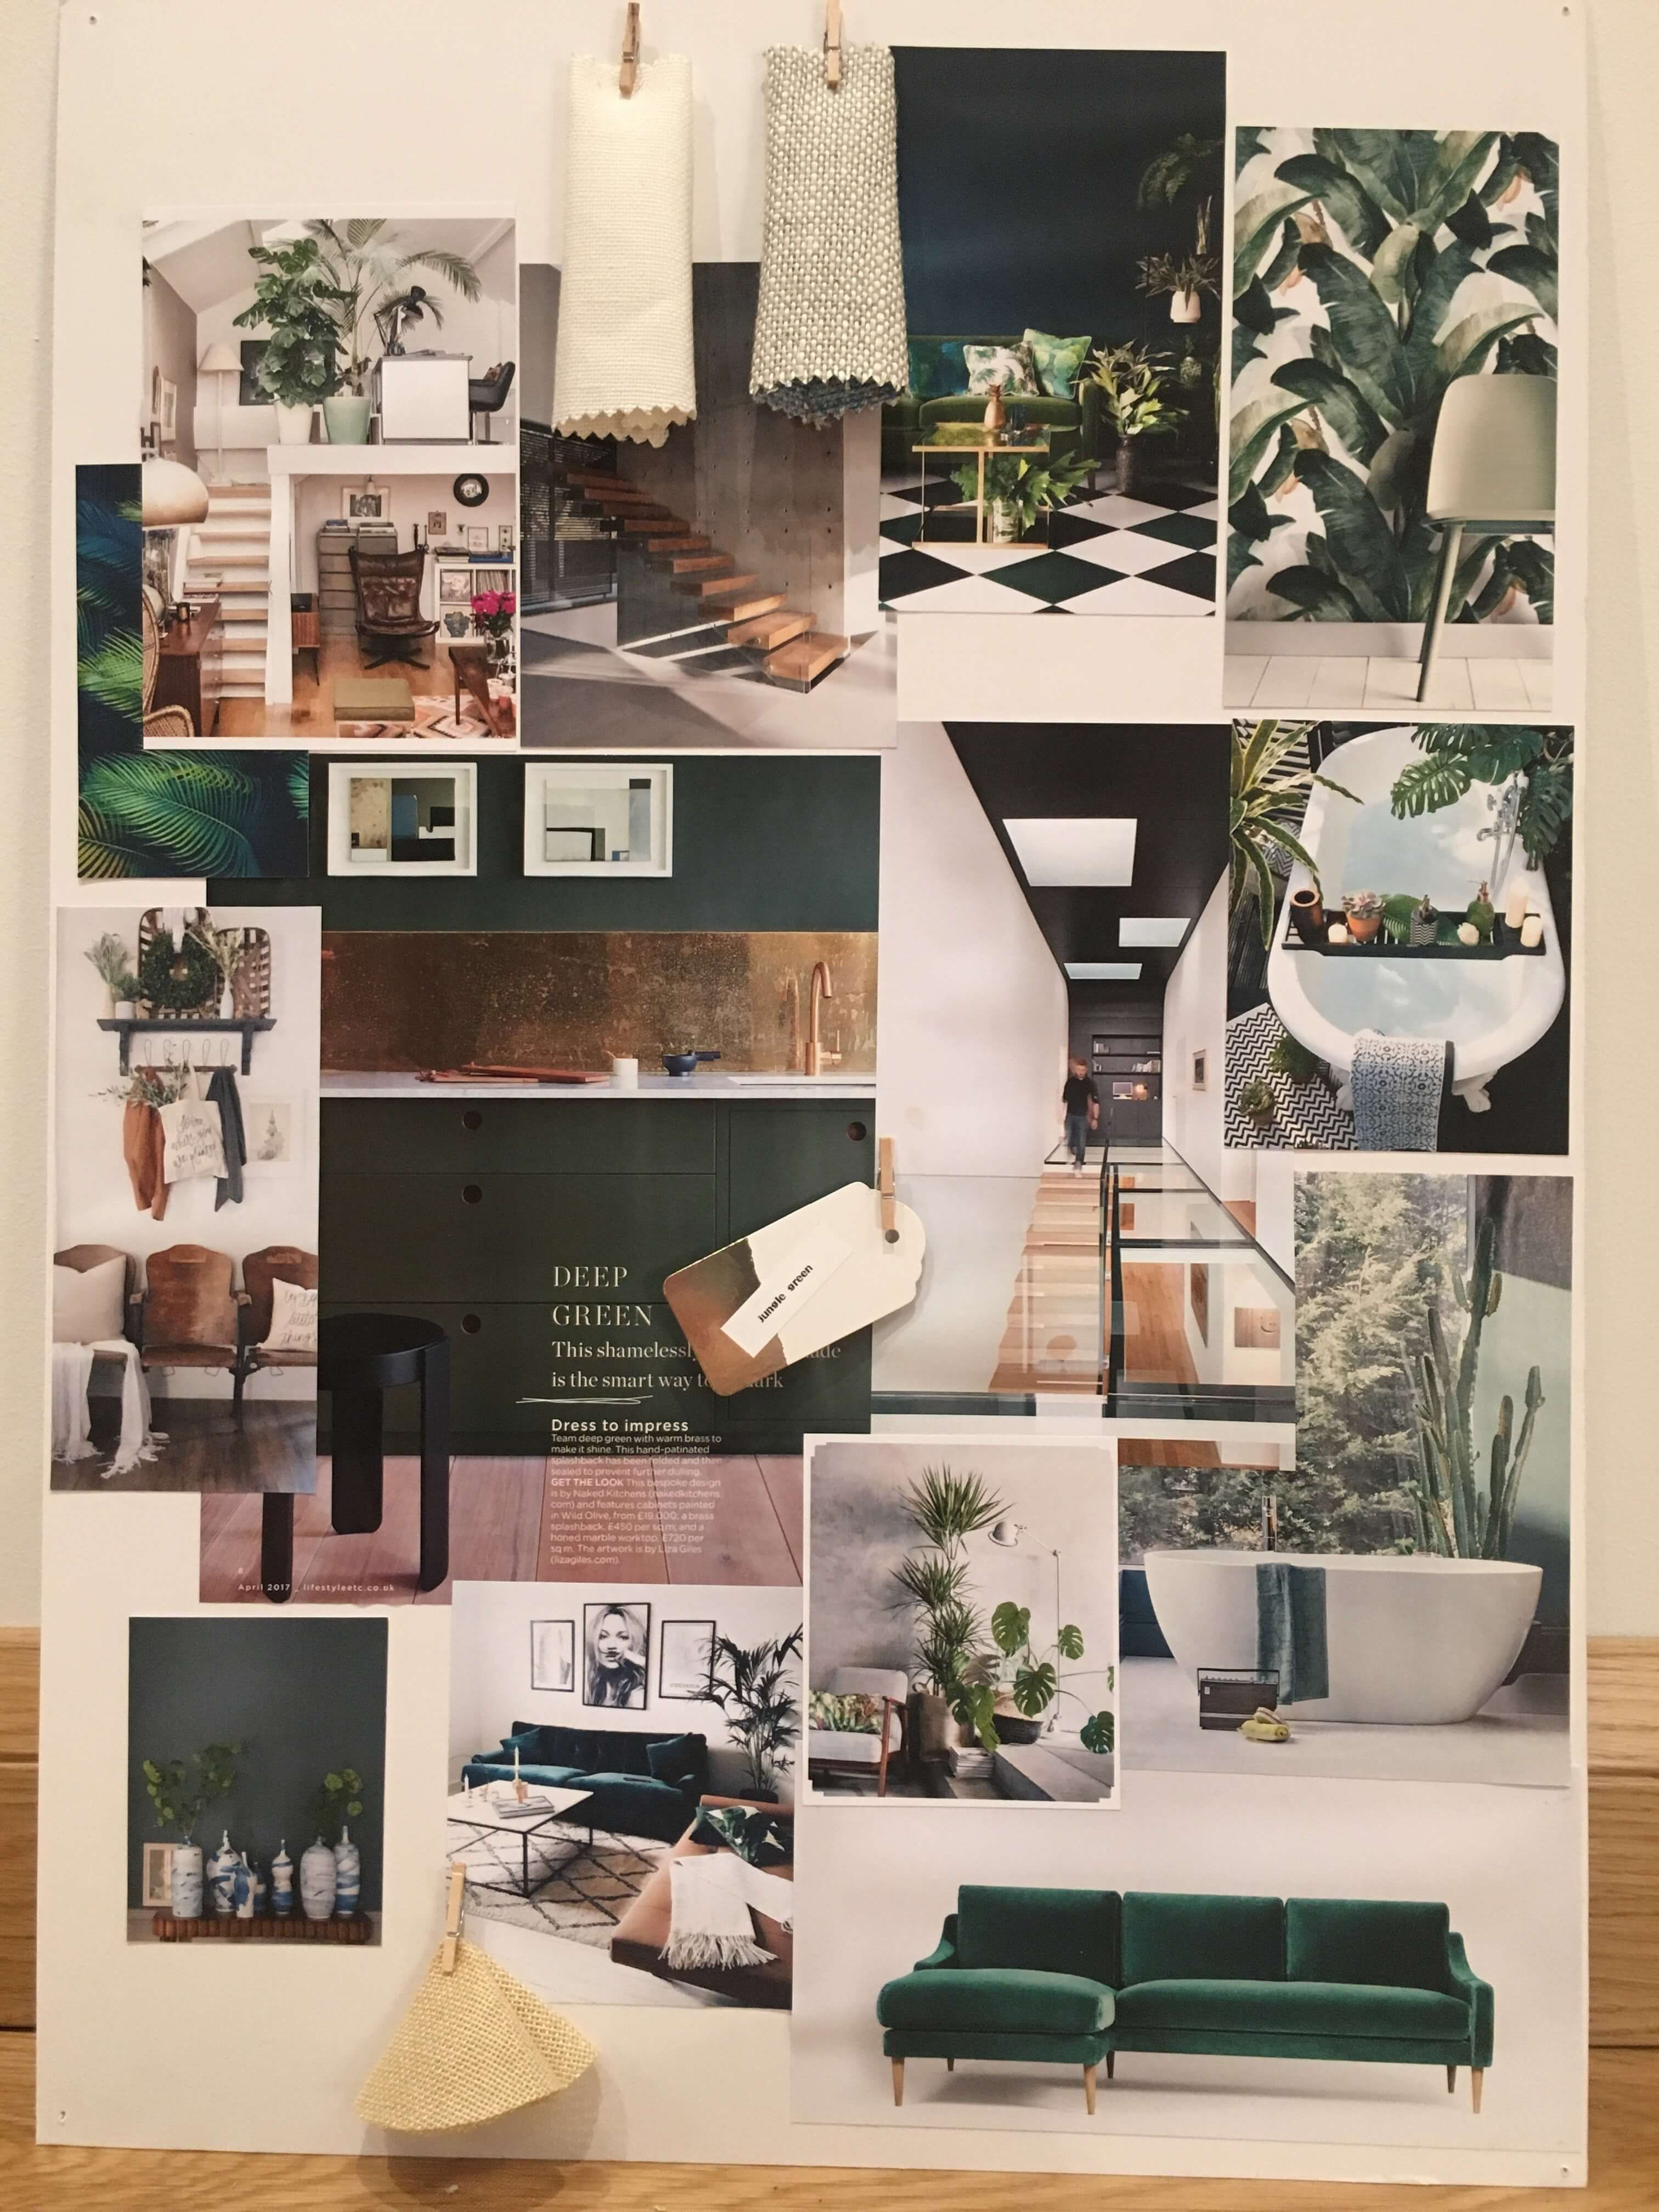 Brainstorm Interior Design Presentation Boards On A Tight Deadline